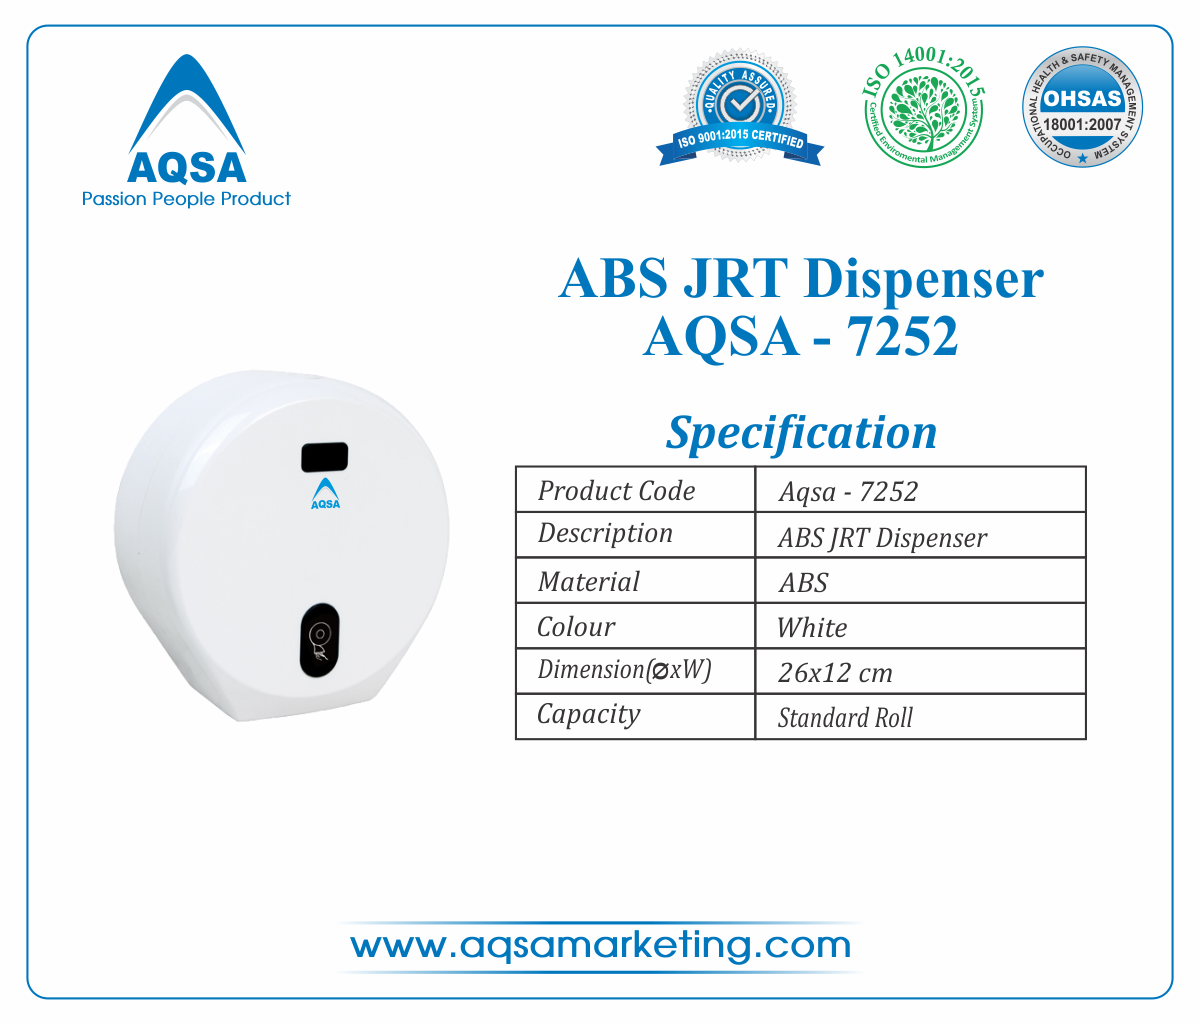 ABS JRT Dispensers